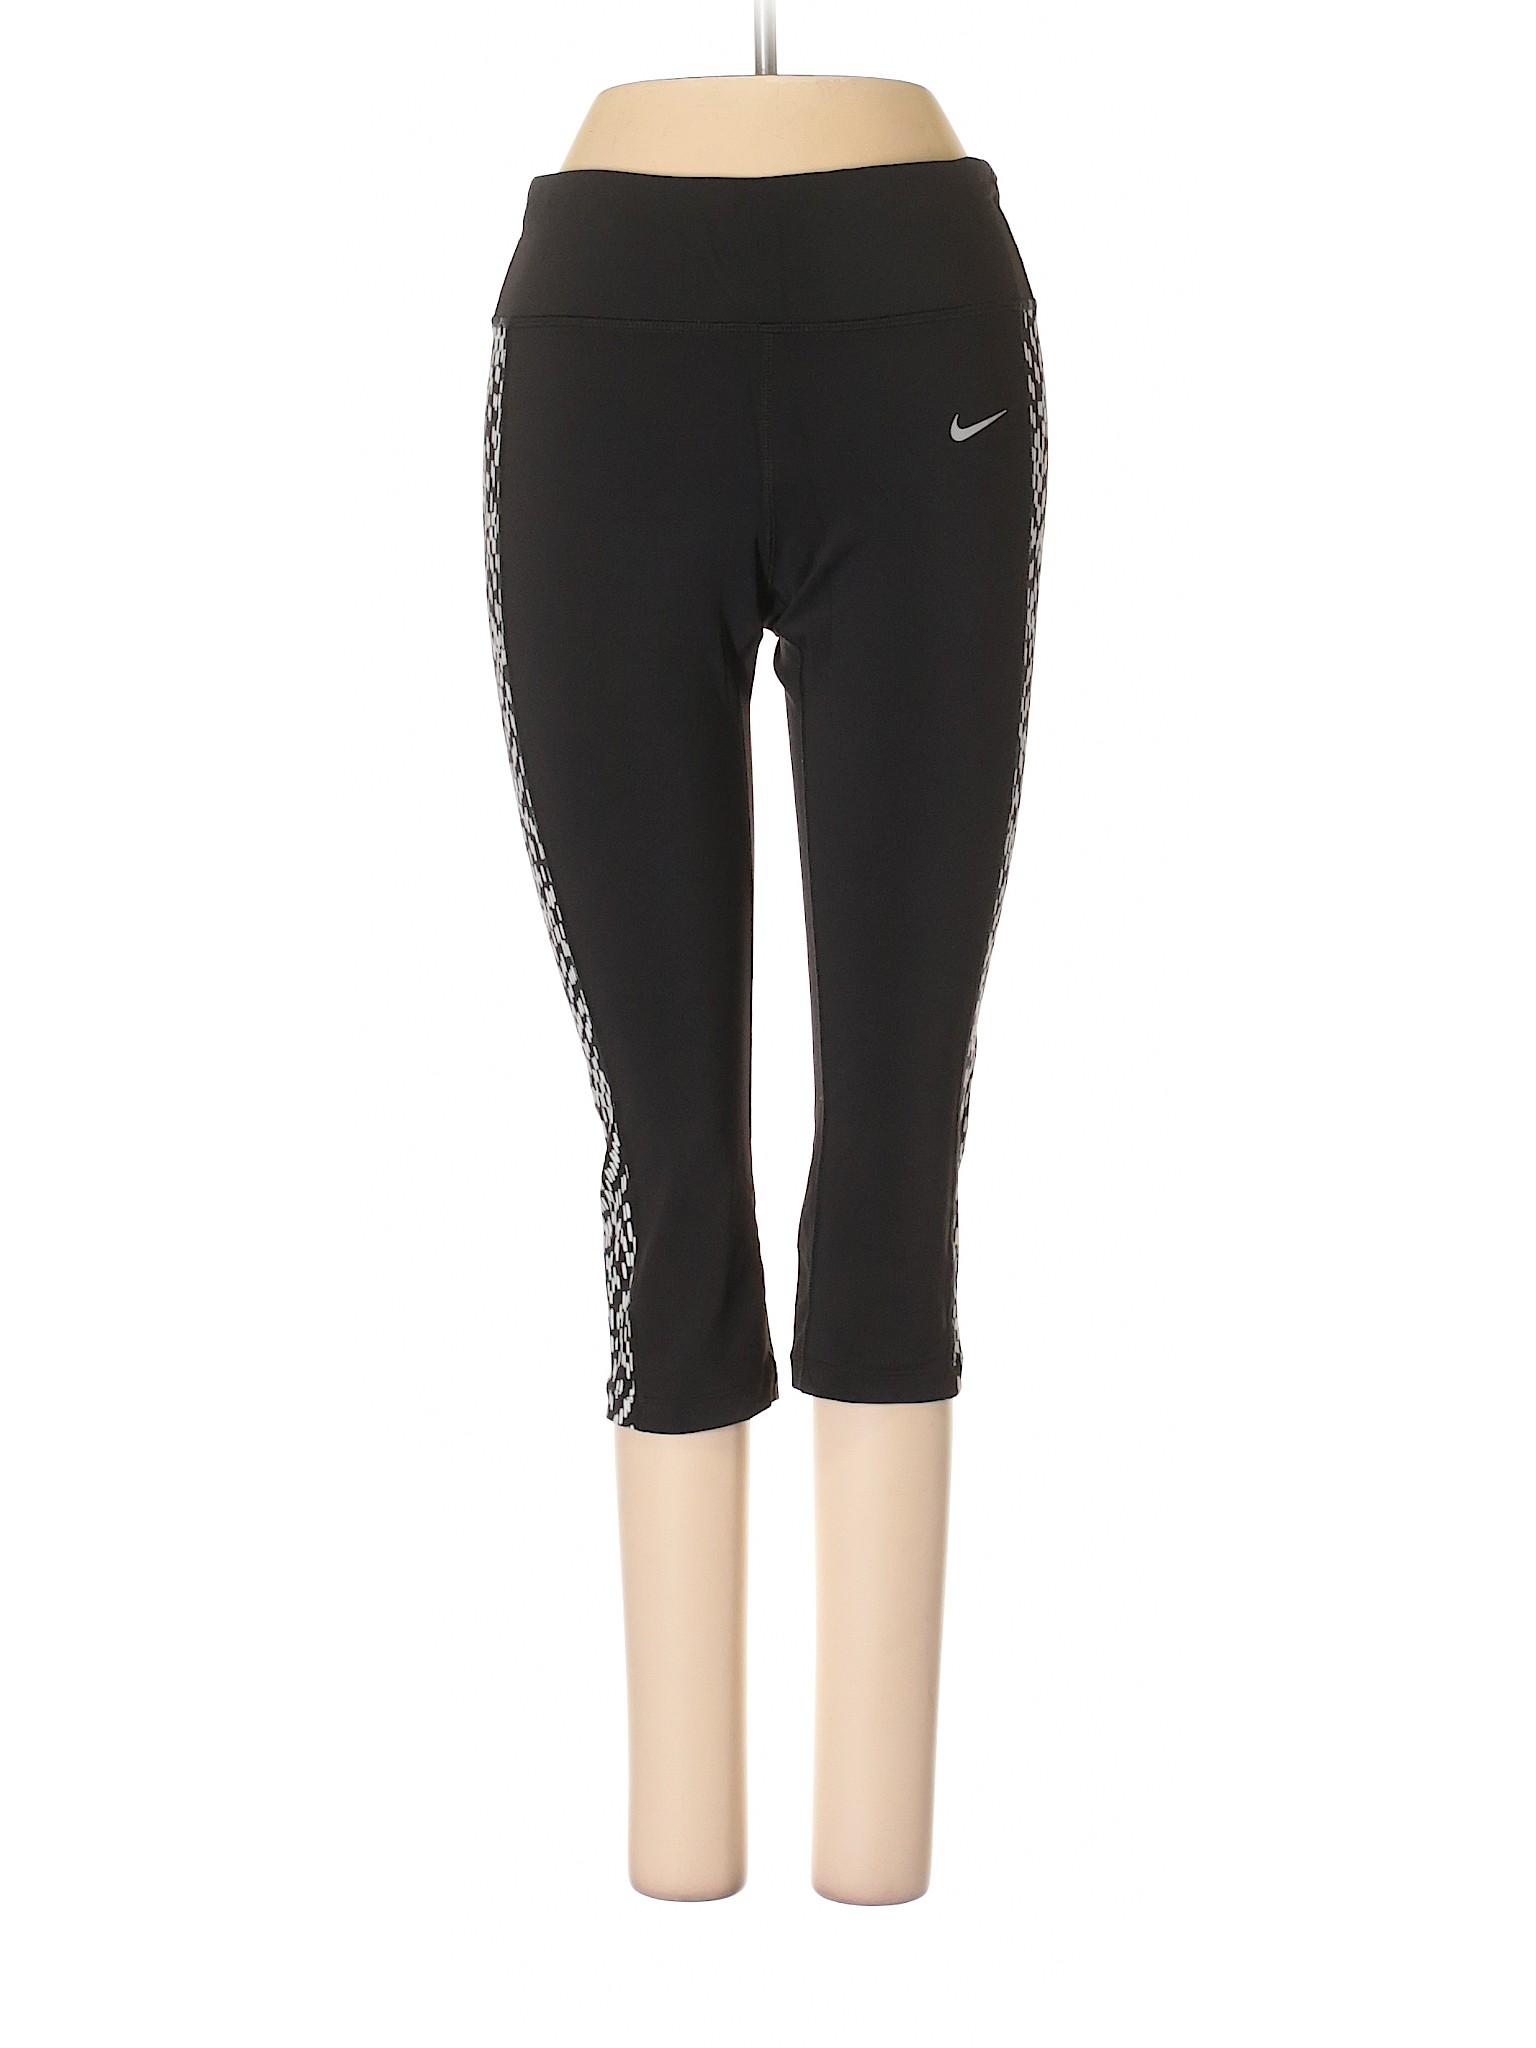 Leisure Pants Nike winter Active Leisure winter OZdwapaqU